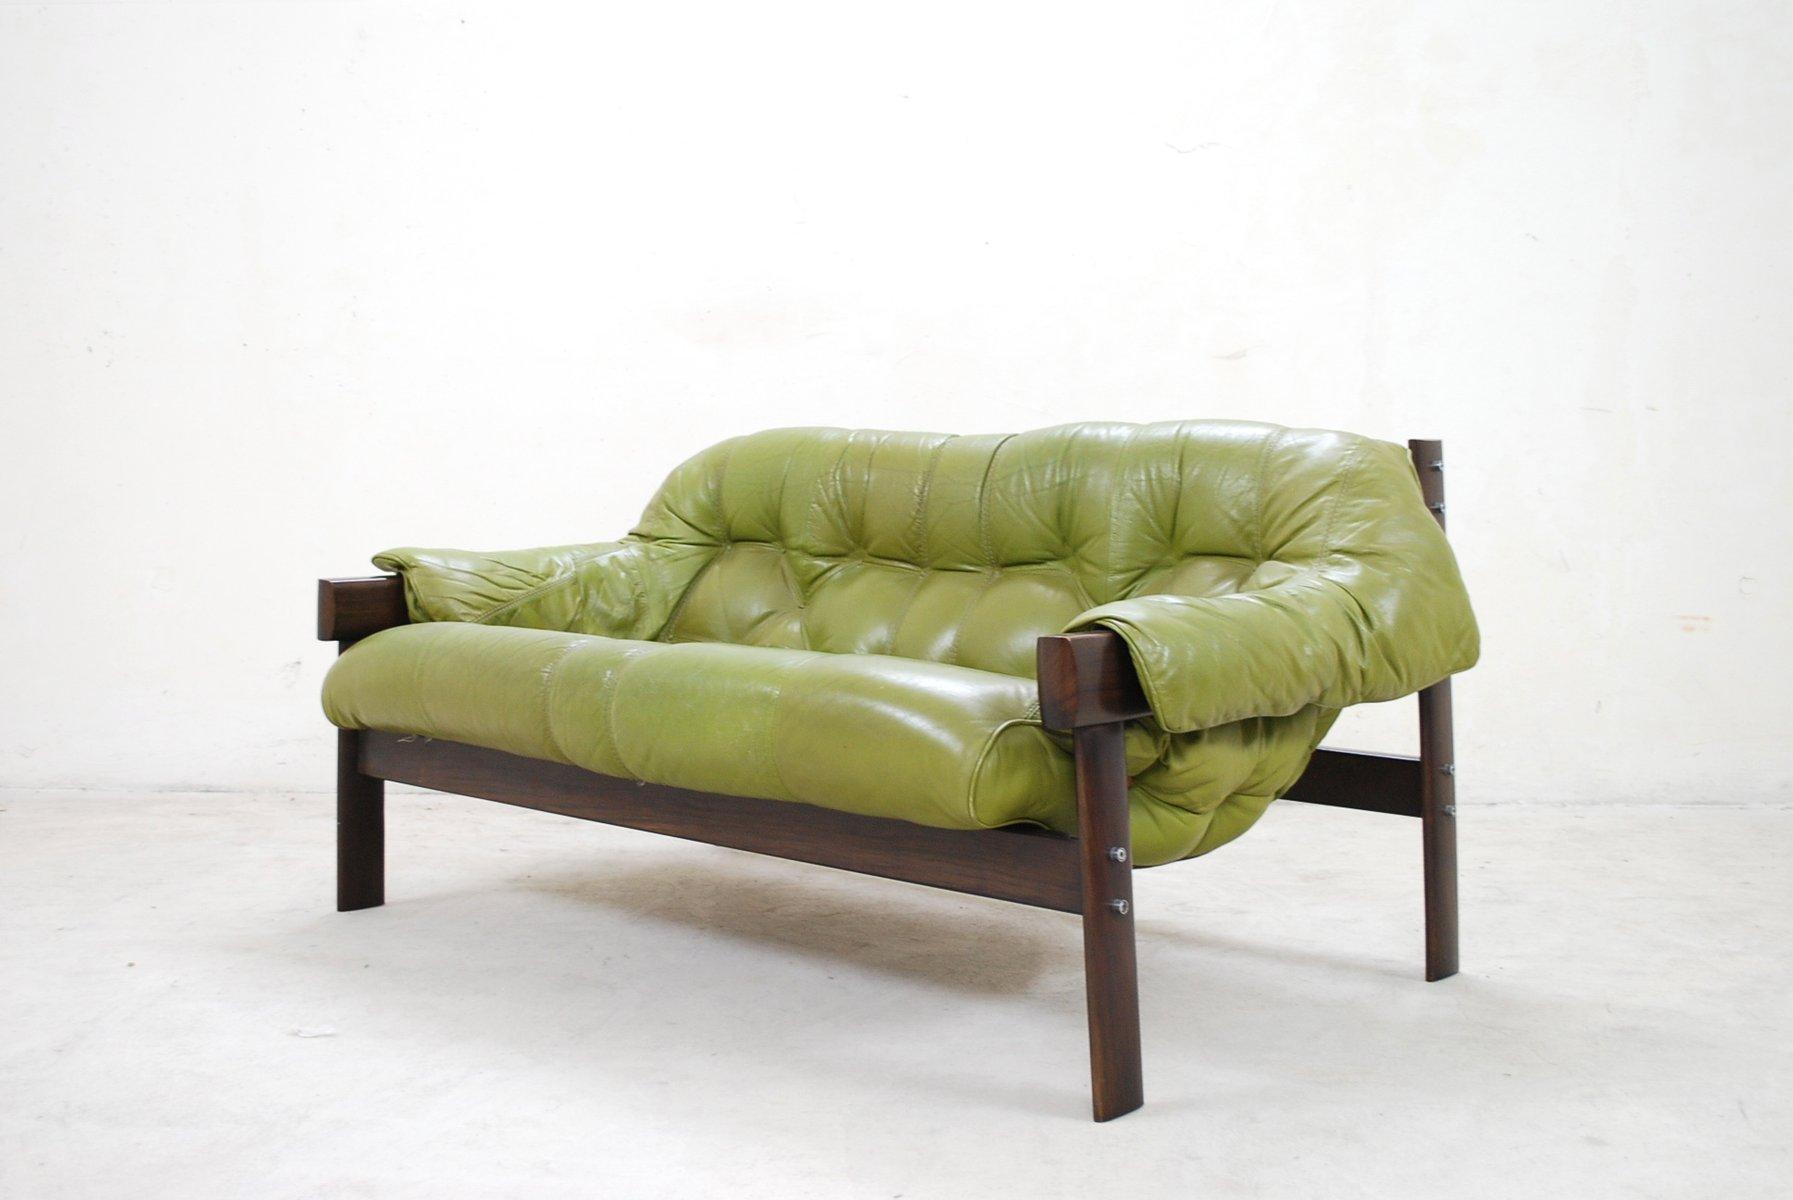 Canap model mp 041 vert en cuir de percival lafer 1962 en vente sur pamono - Canape cuir vert ...